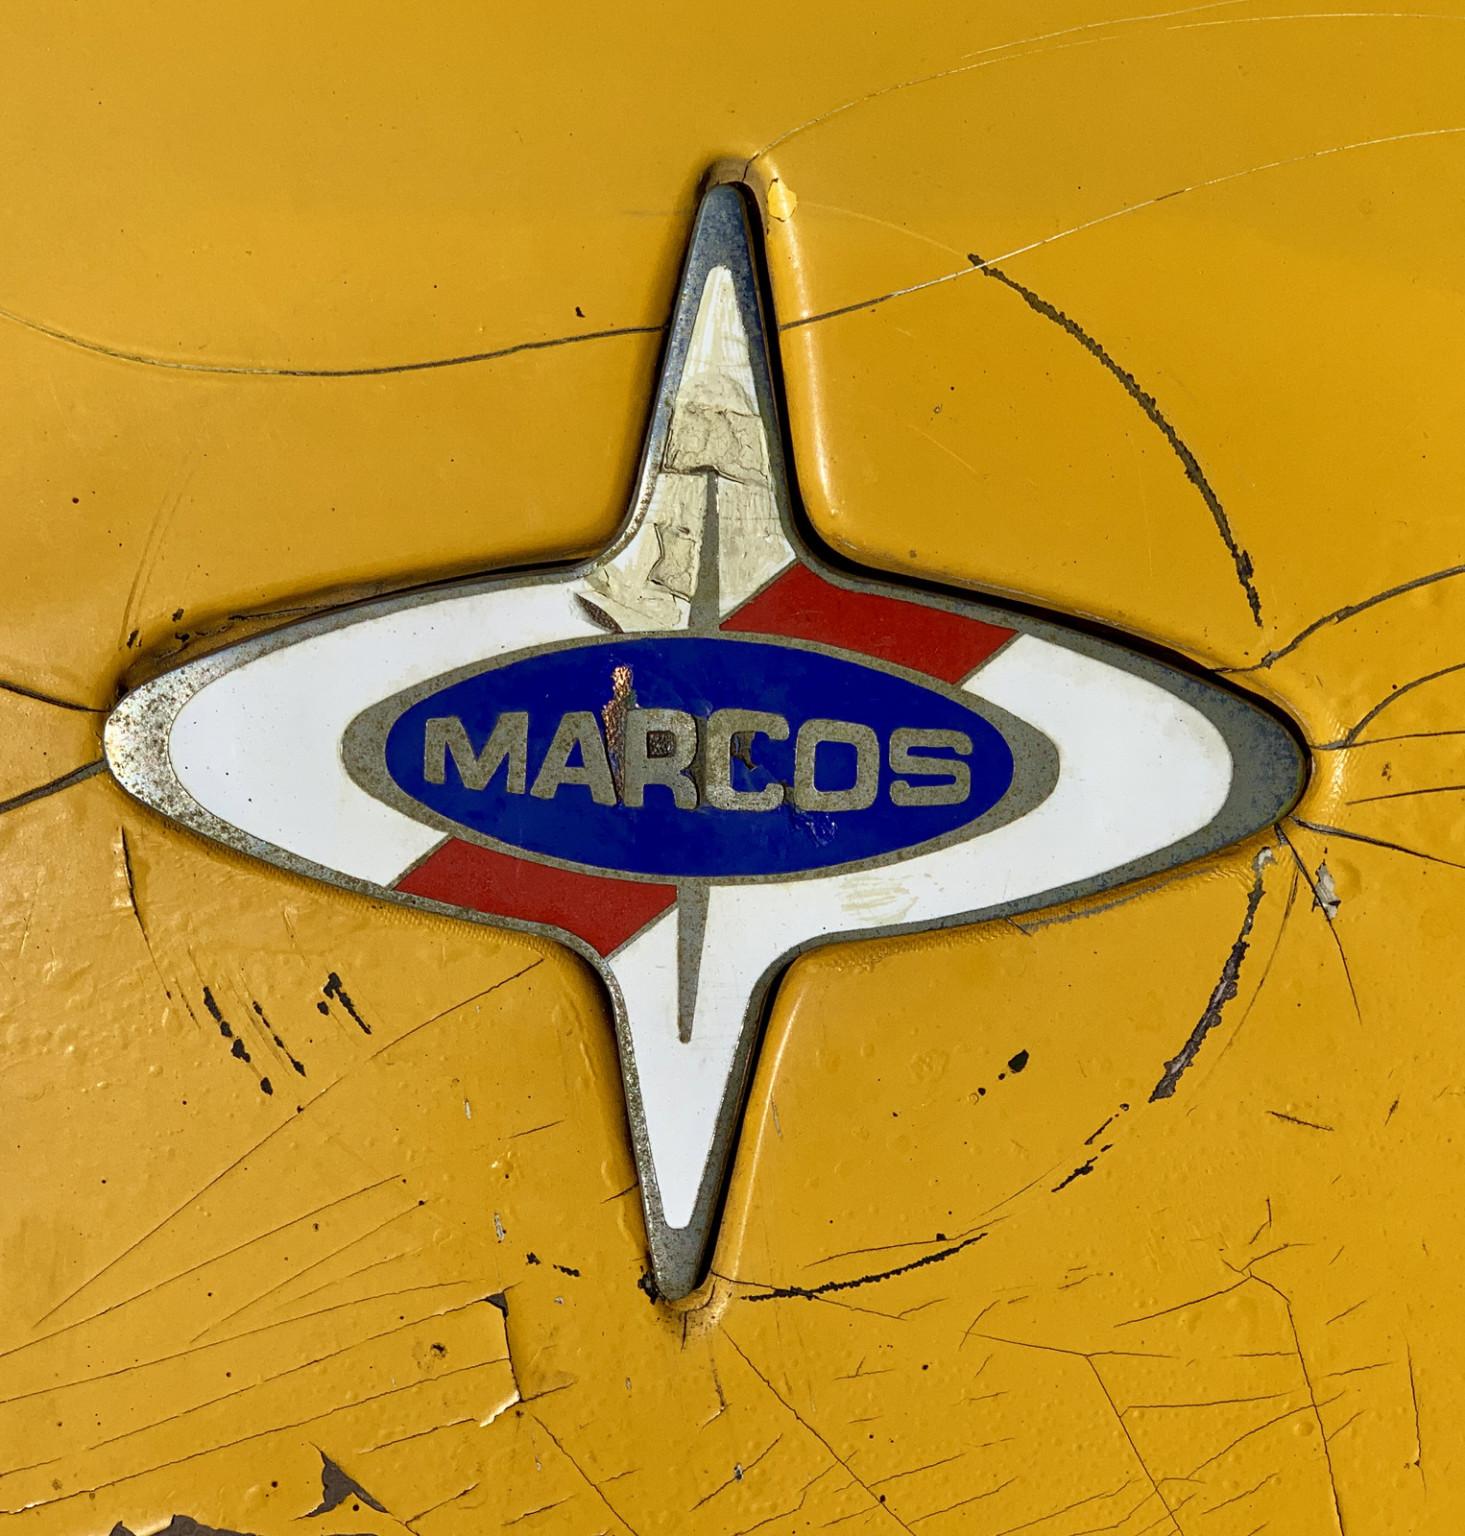 1969 Marcos badge